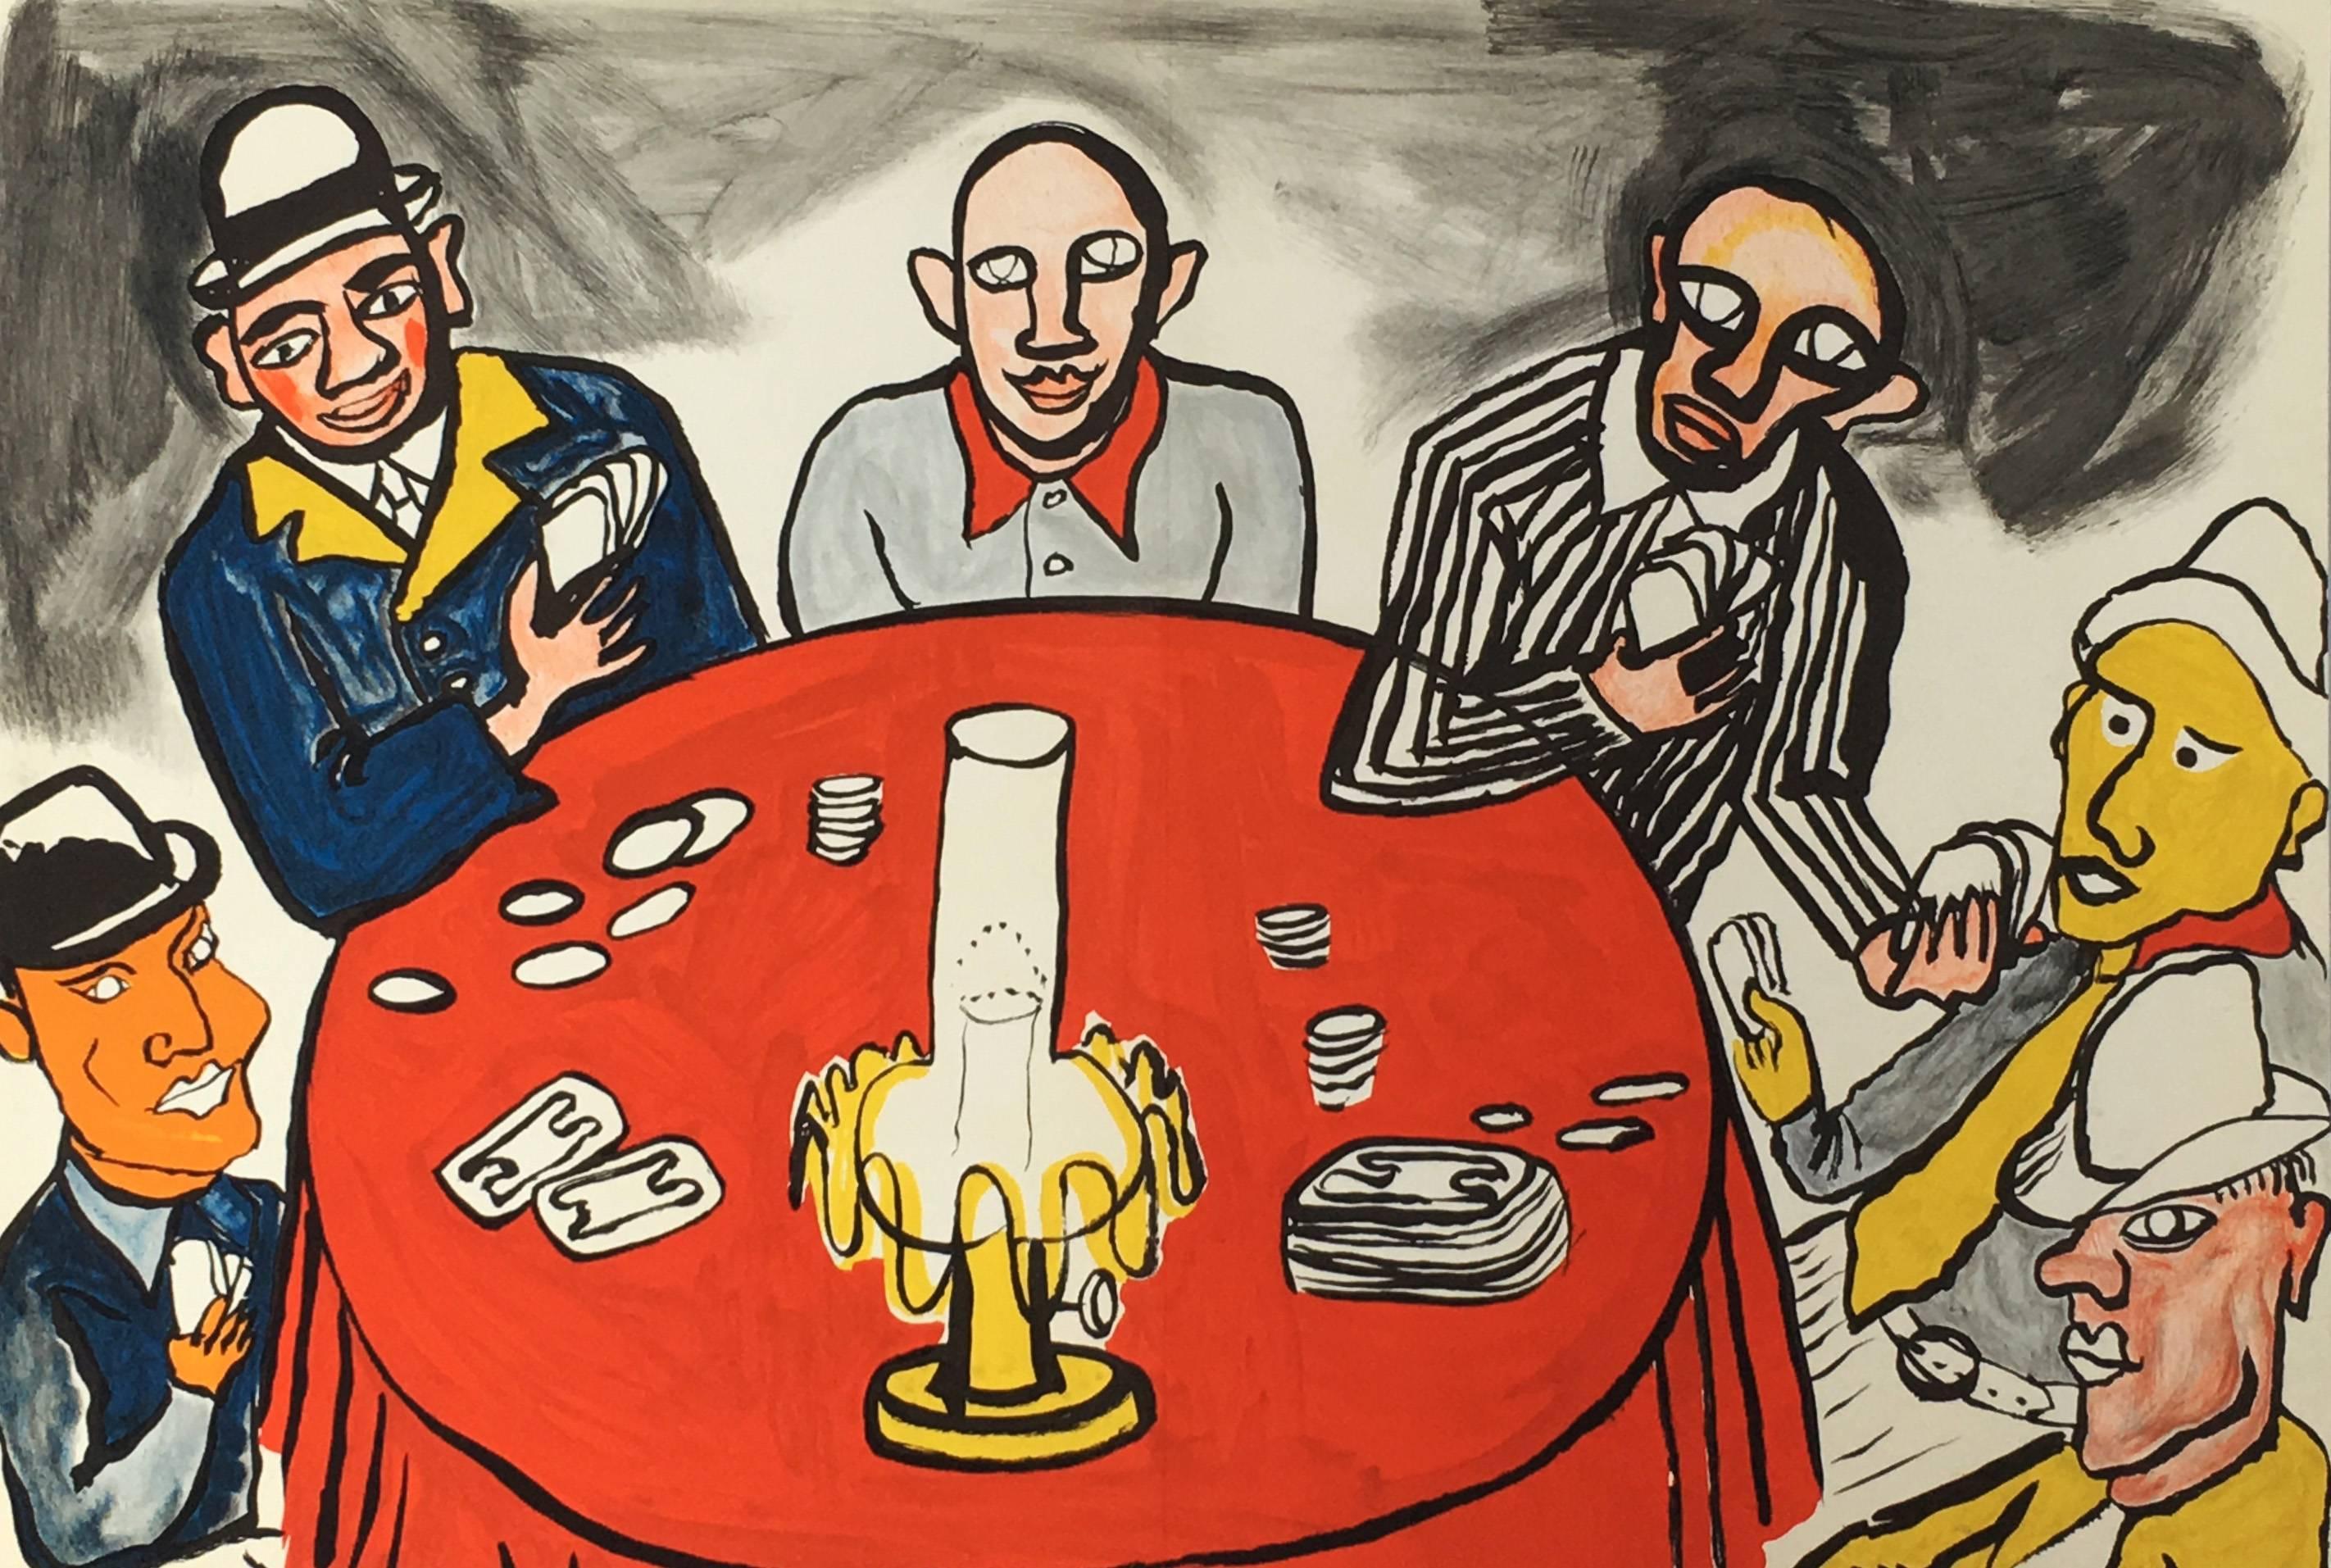 Alexander Calder Card Players lithograph (Derriere Le Miroir)